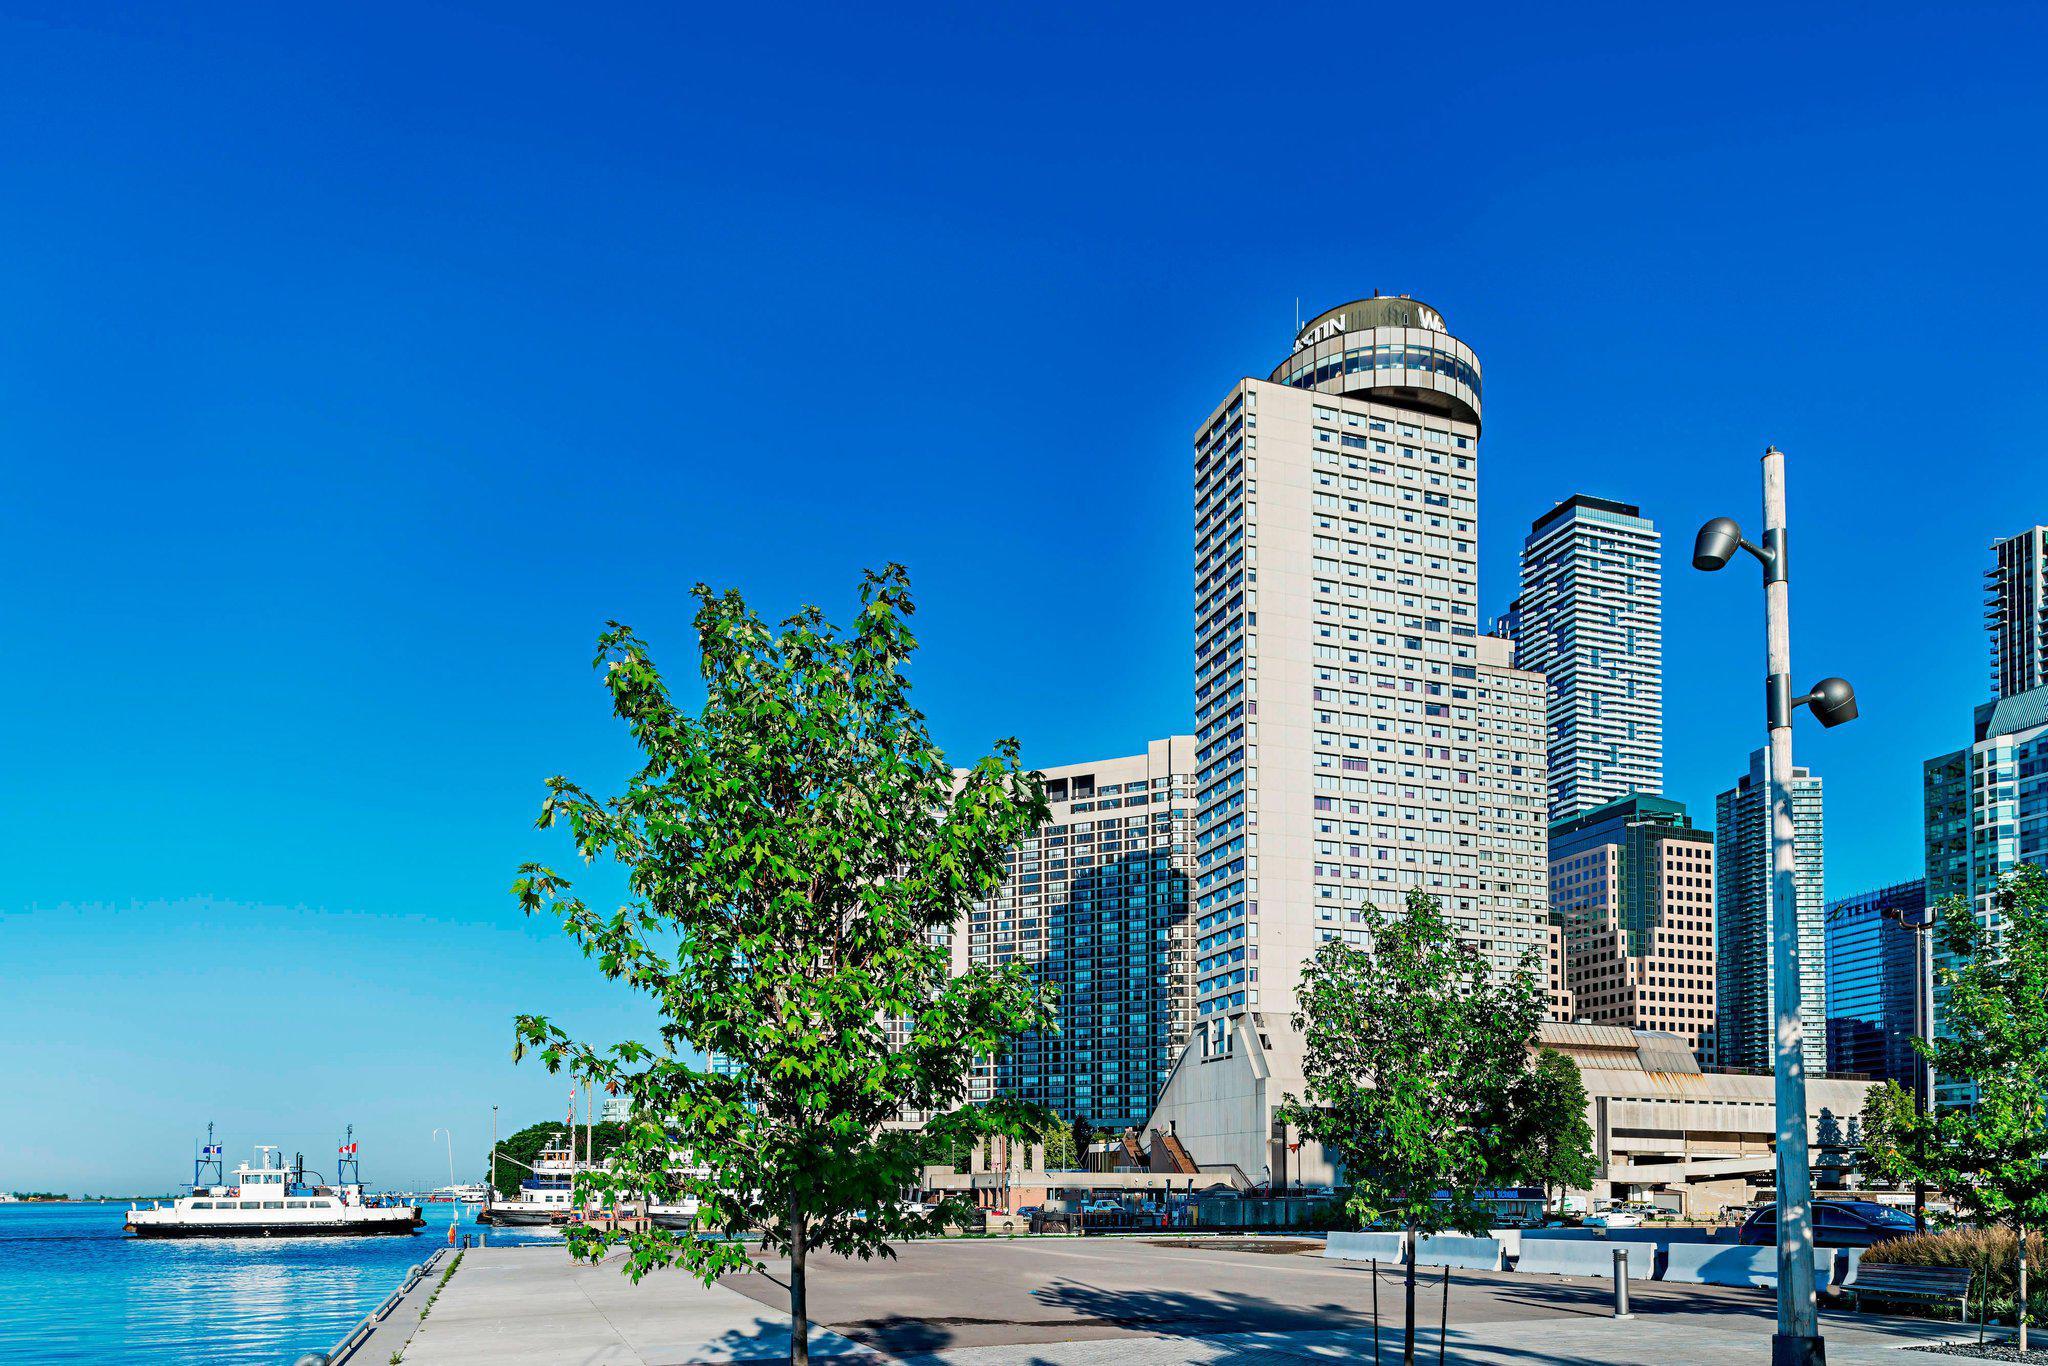 The Westin Harbour Castle, Toronto